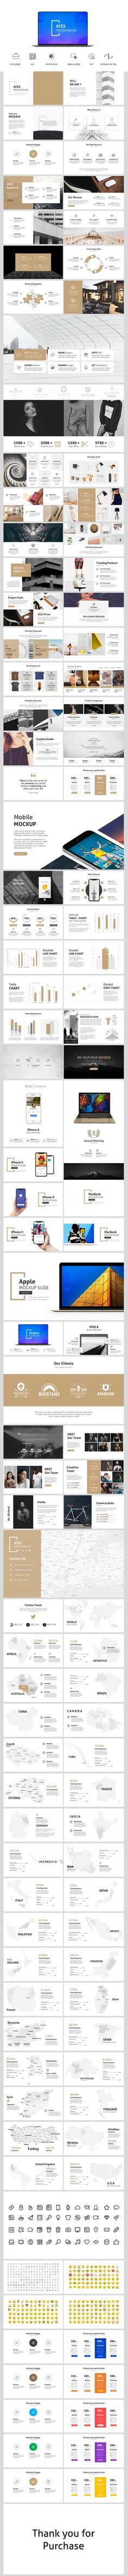 Aces - Minimal Powerpoint Template - PowerPoint Templates Presentation Templates